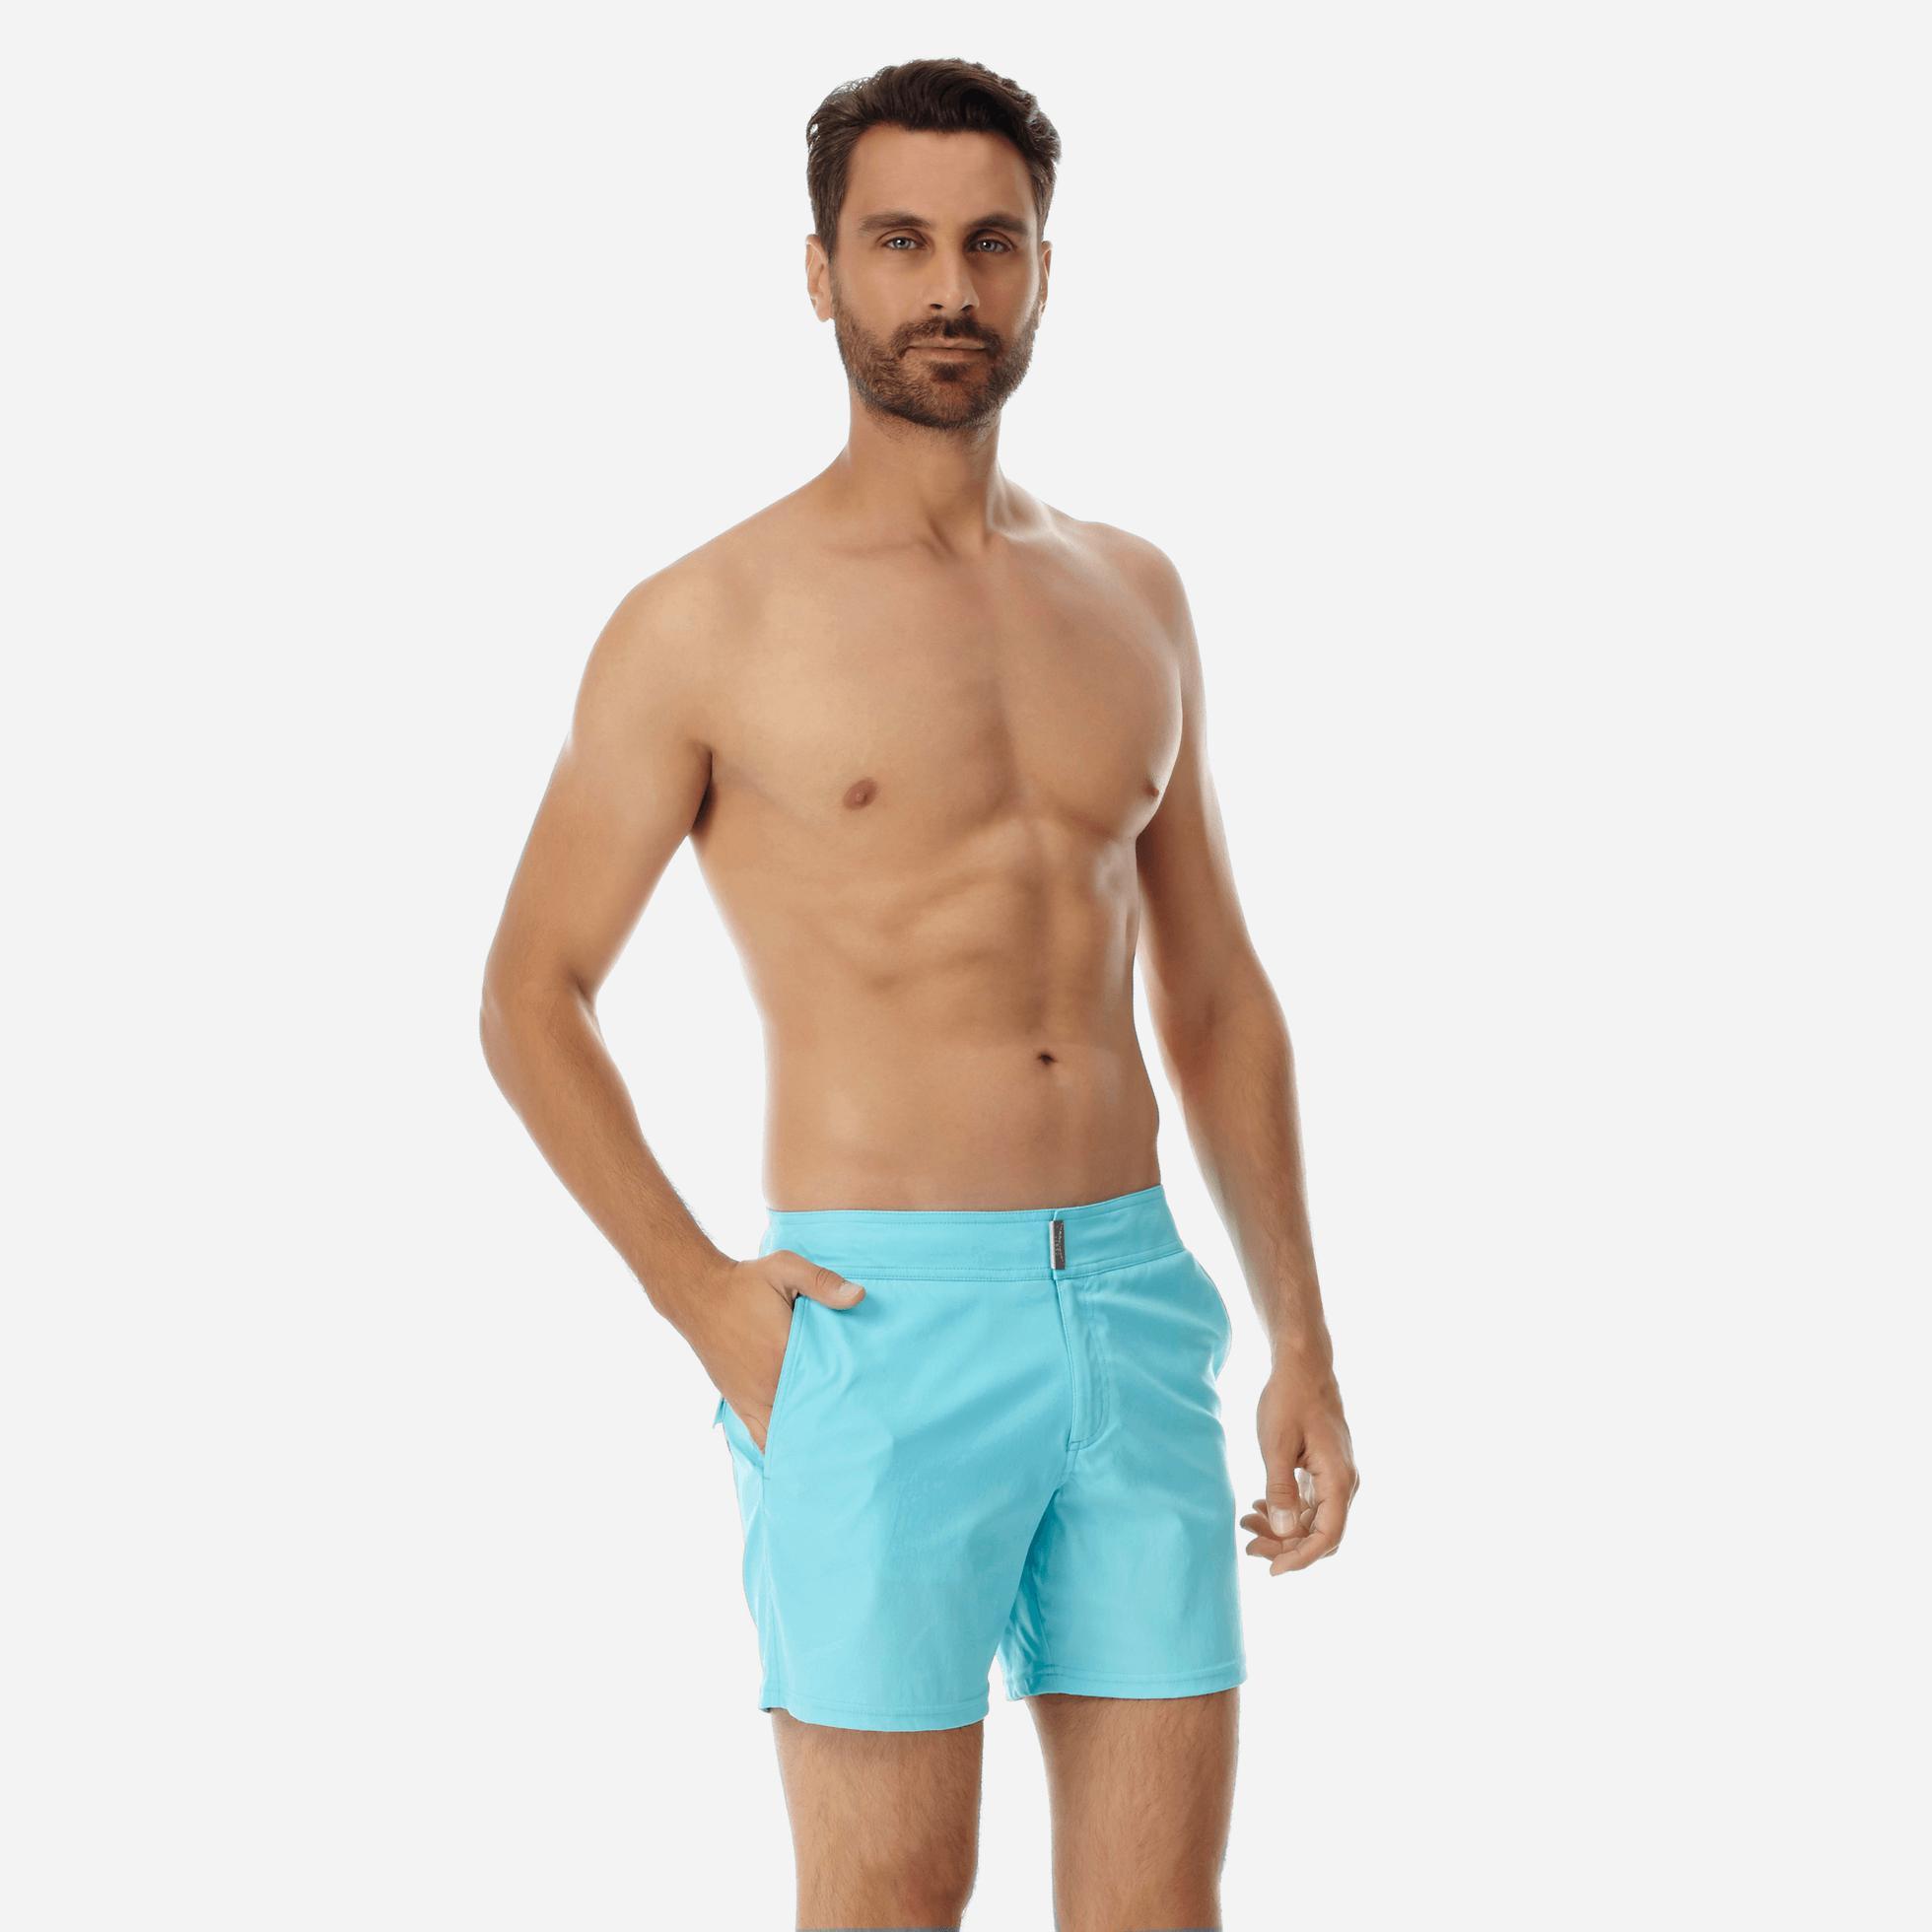 899f4df594 ... Blue Men Flat Belt Stretch Swimwear Solid for Men - Lyst. Visit  Vilebrequin. Tap to visit site